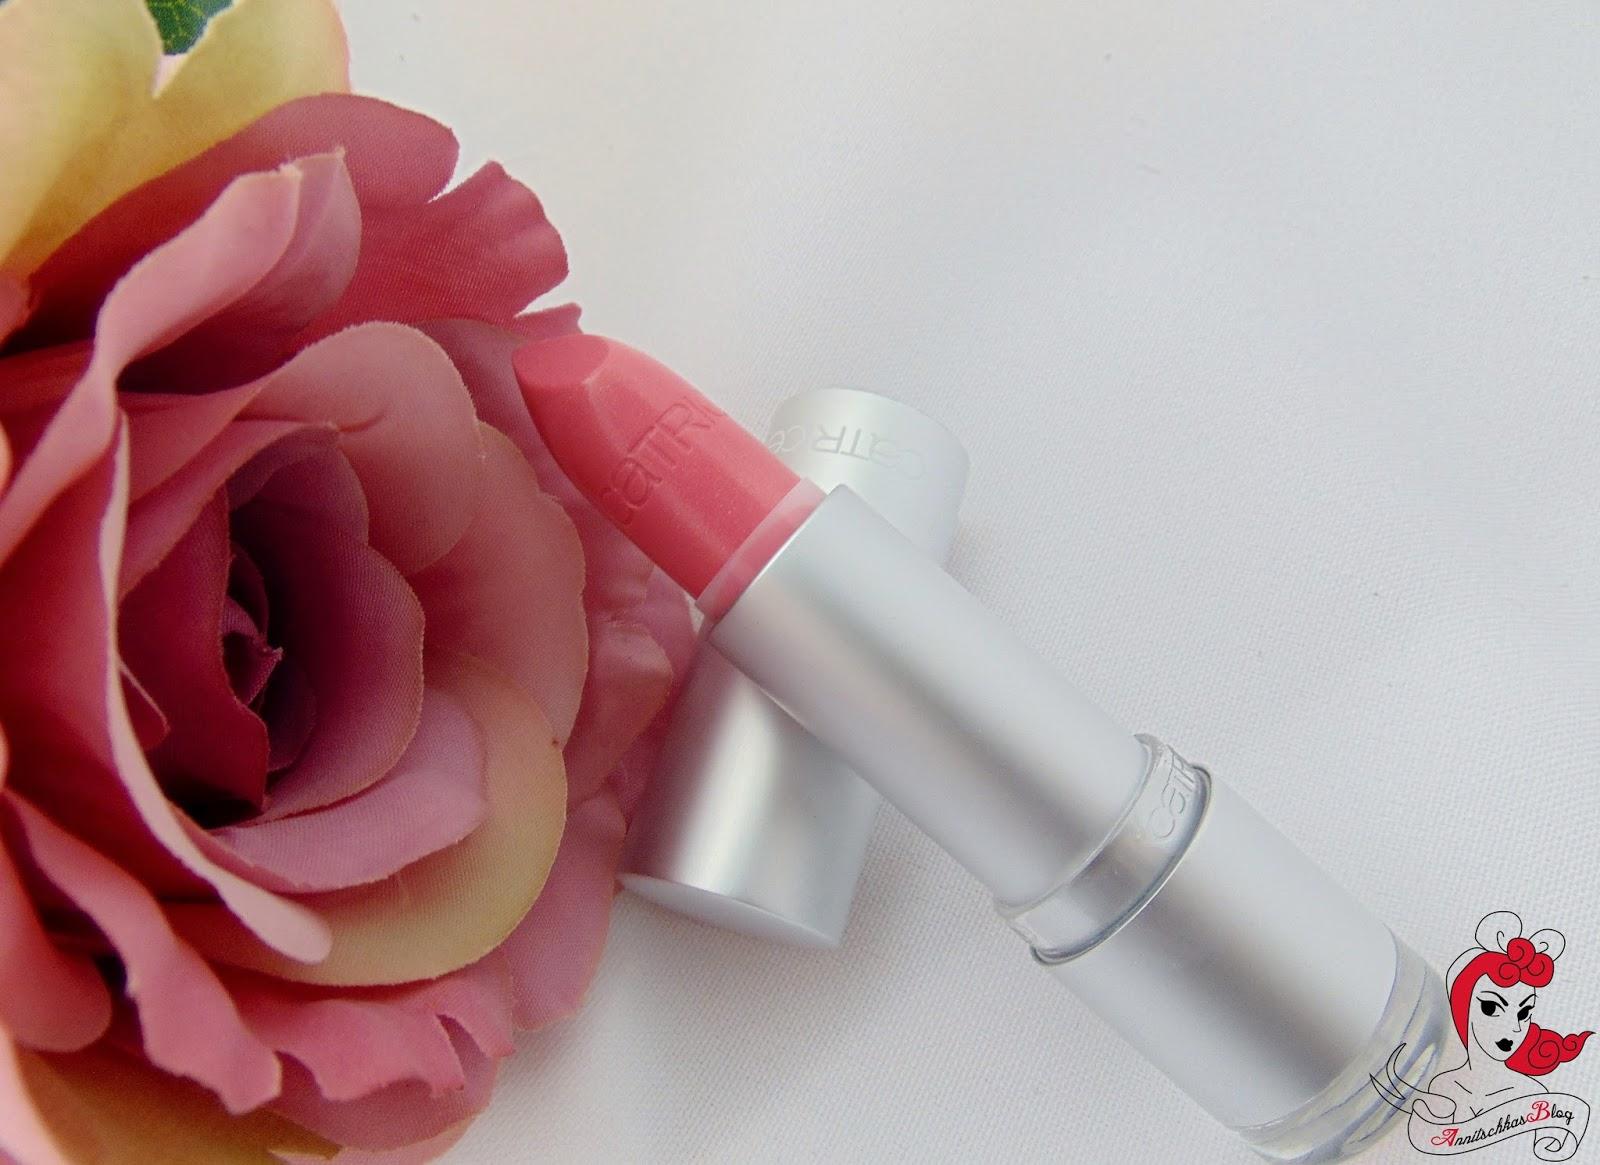 Catrice - Luminous Lips - 090 Lovable Me - www.annitschkasblog.de